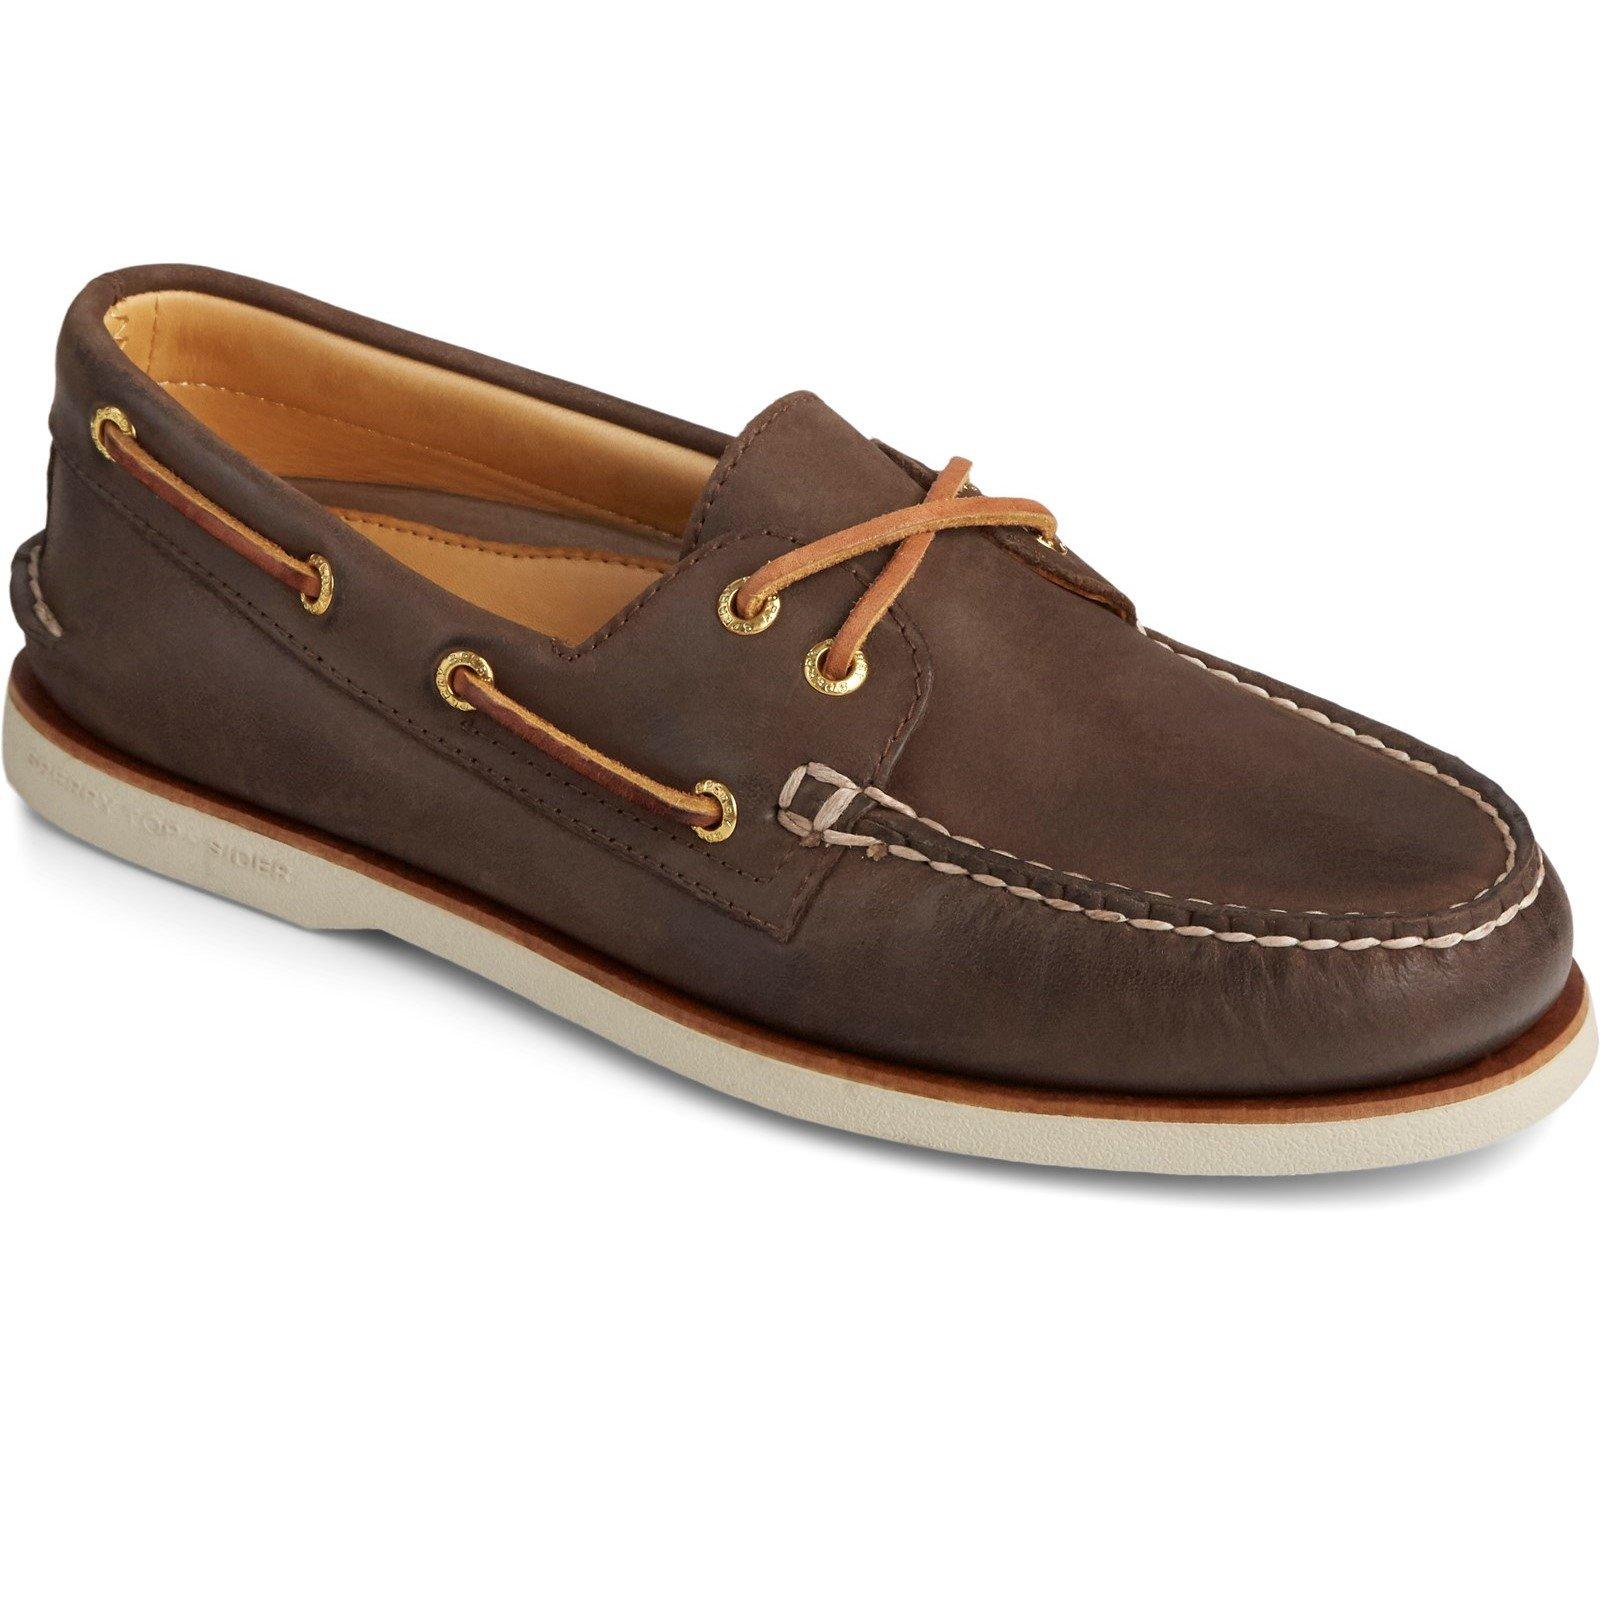 Sperry Men's Cup Authentic Original Boat Shoe Various Colours 31735 - Brown 6